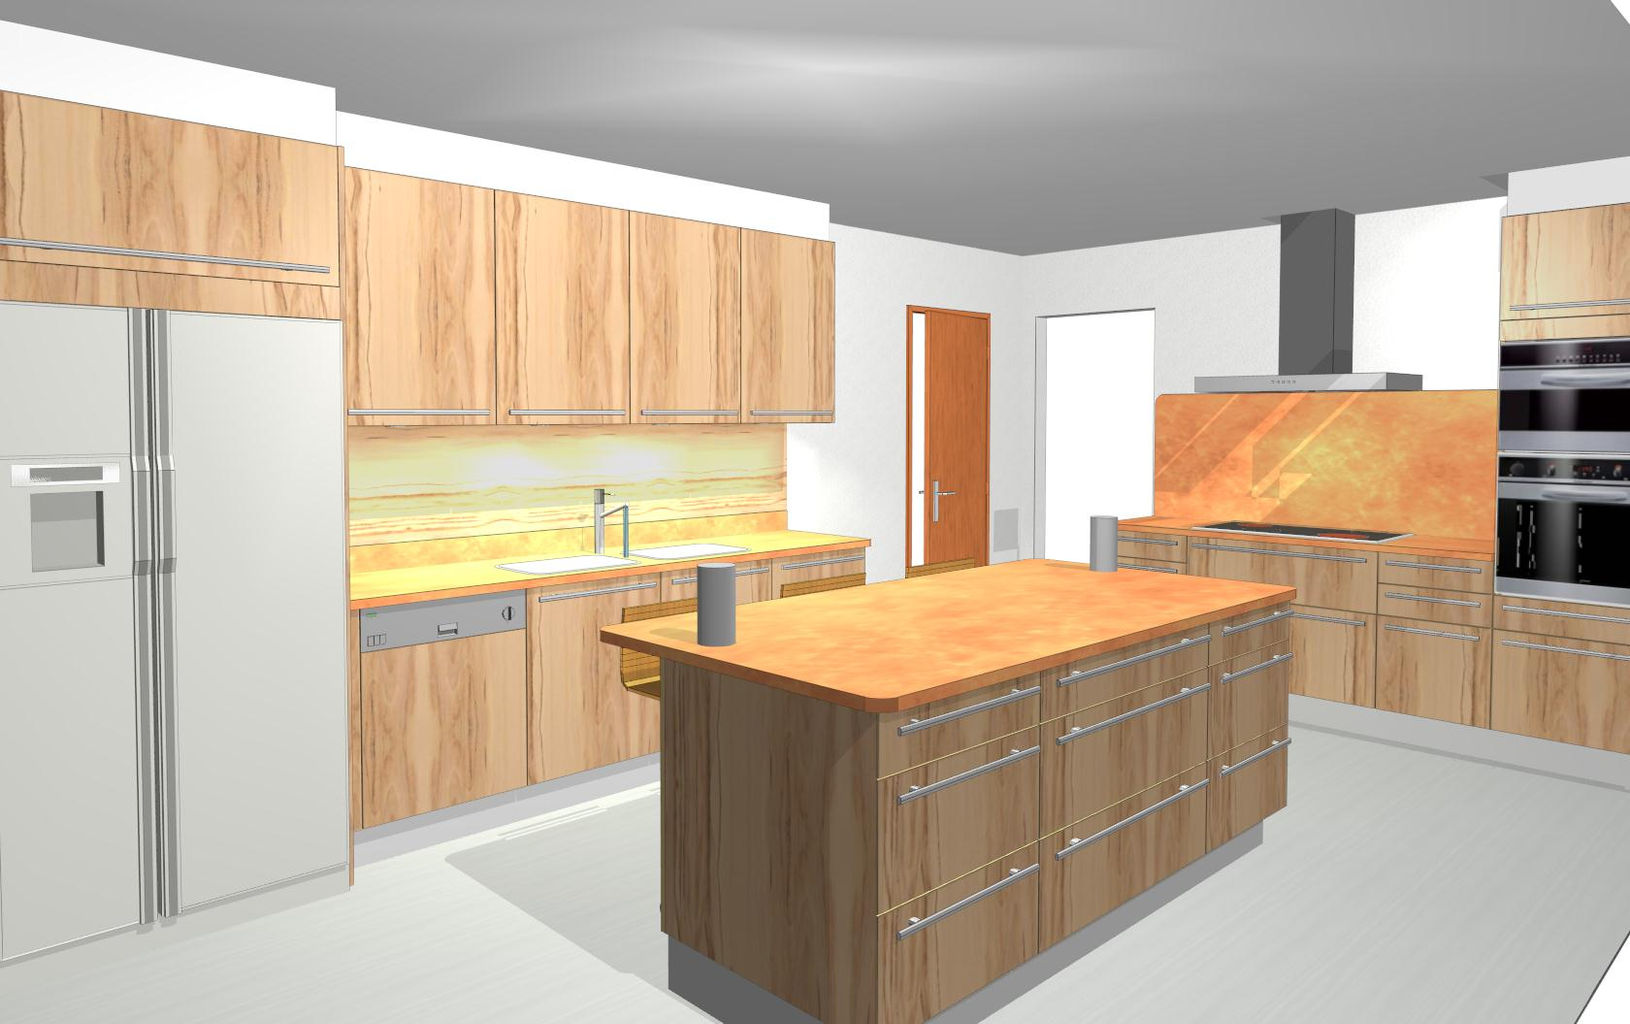 Cucina moderna arreda progettazione 3d for Programma per 3d interni